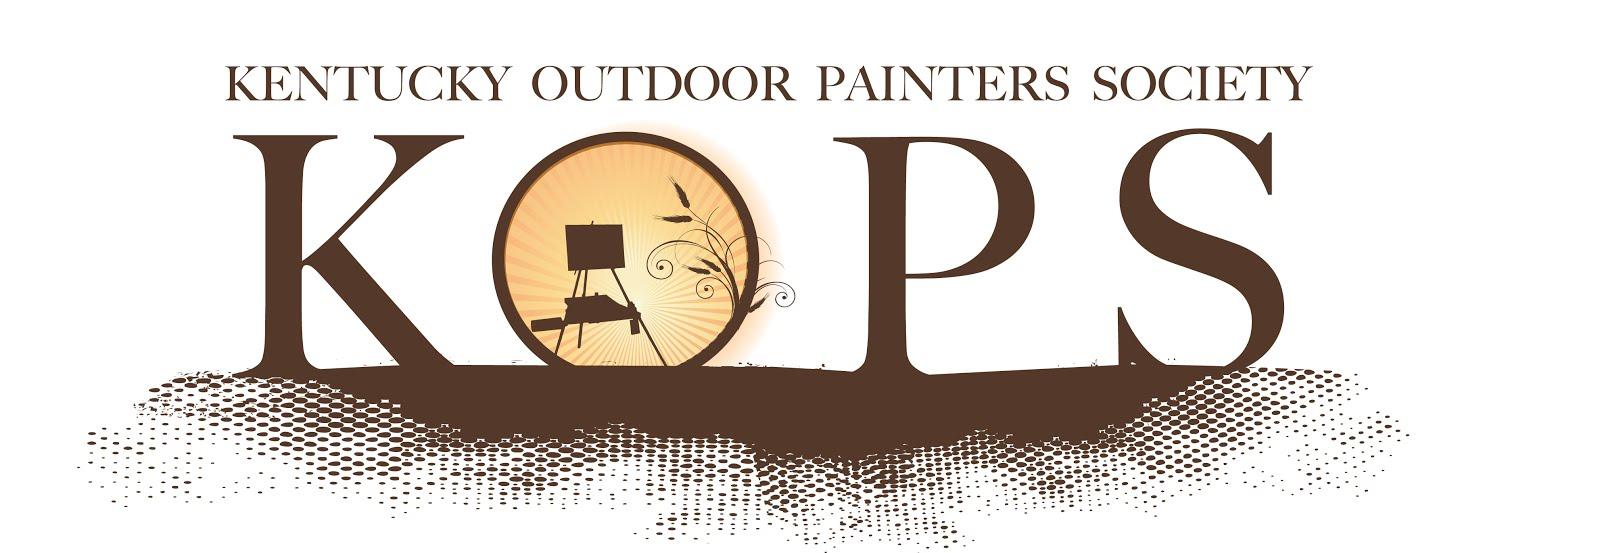 Kentucky Outdoor Painters Society